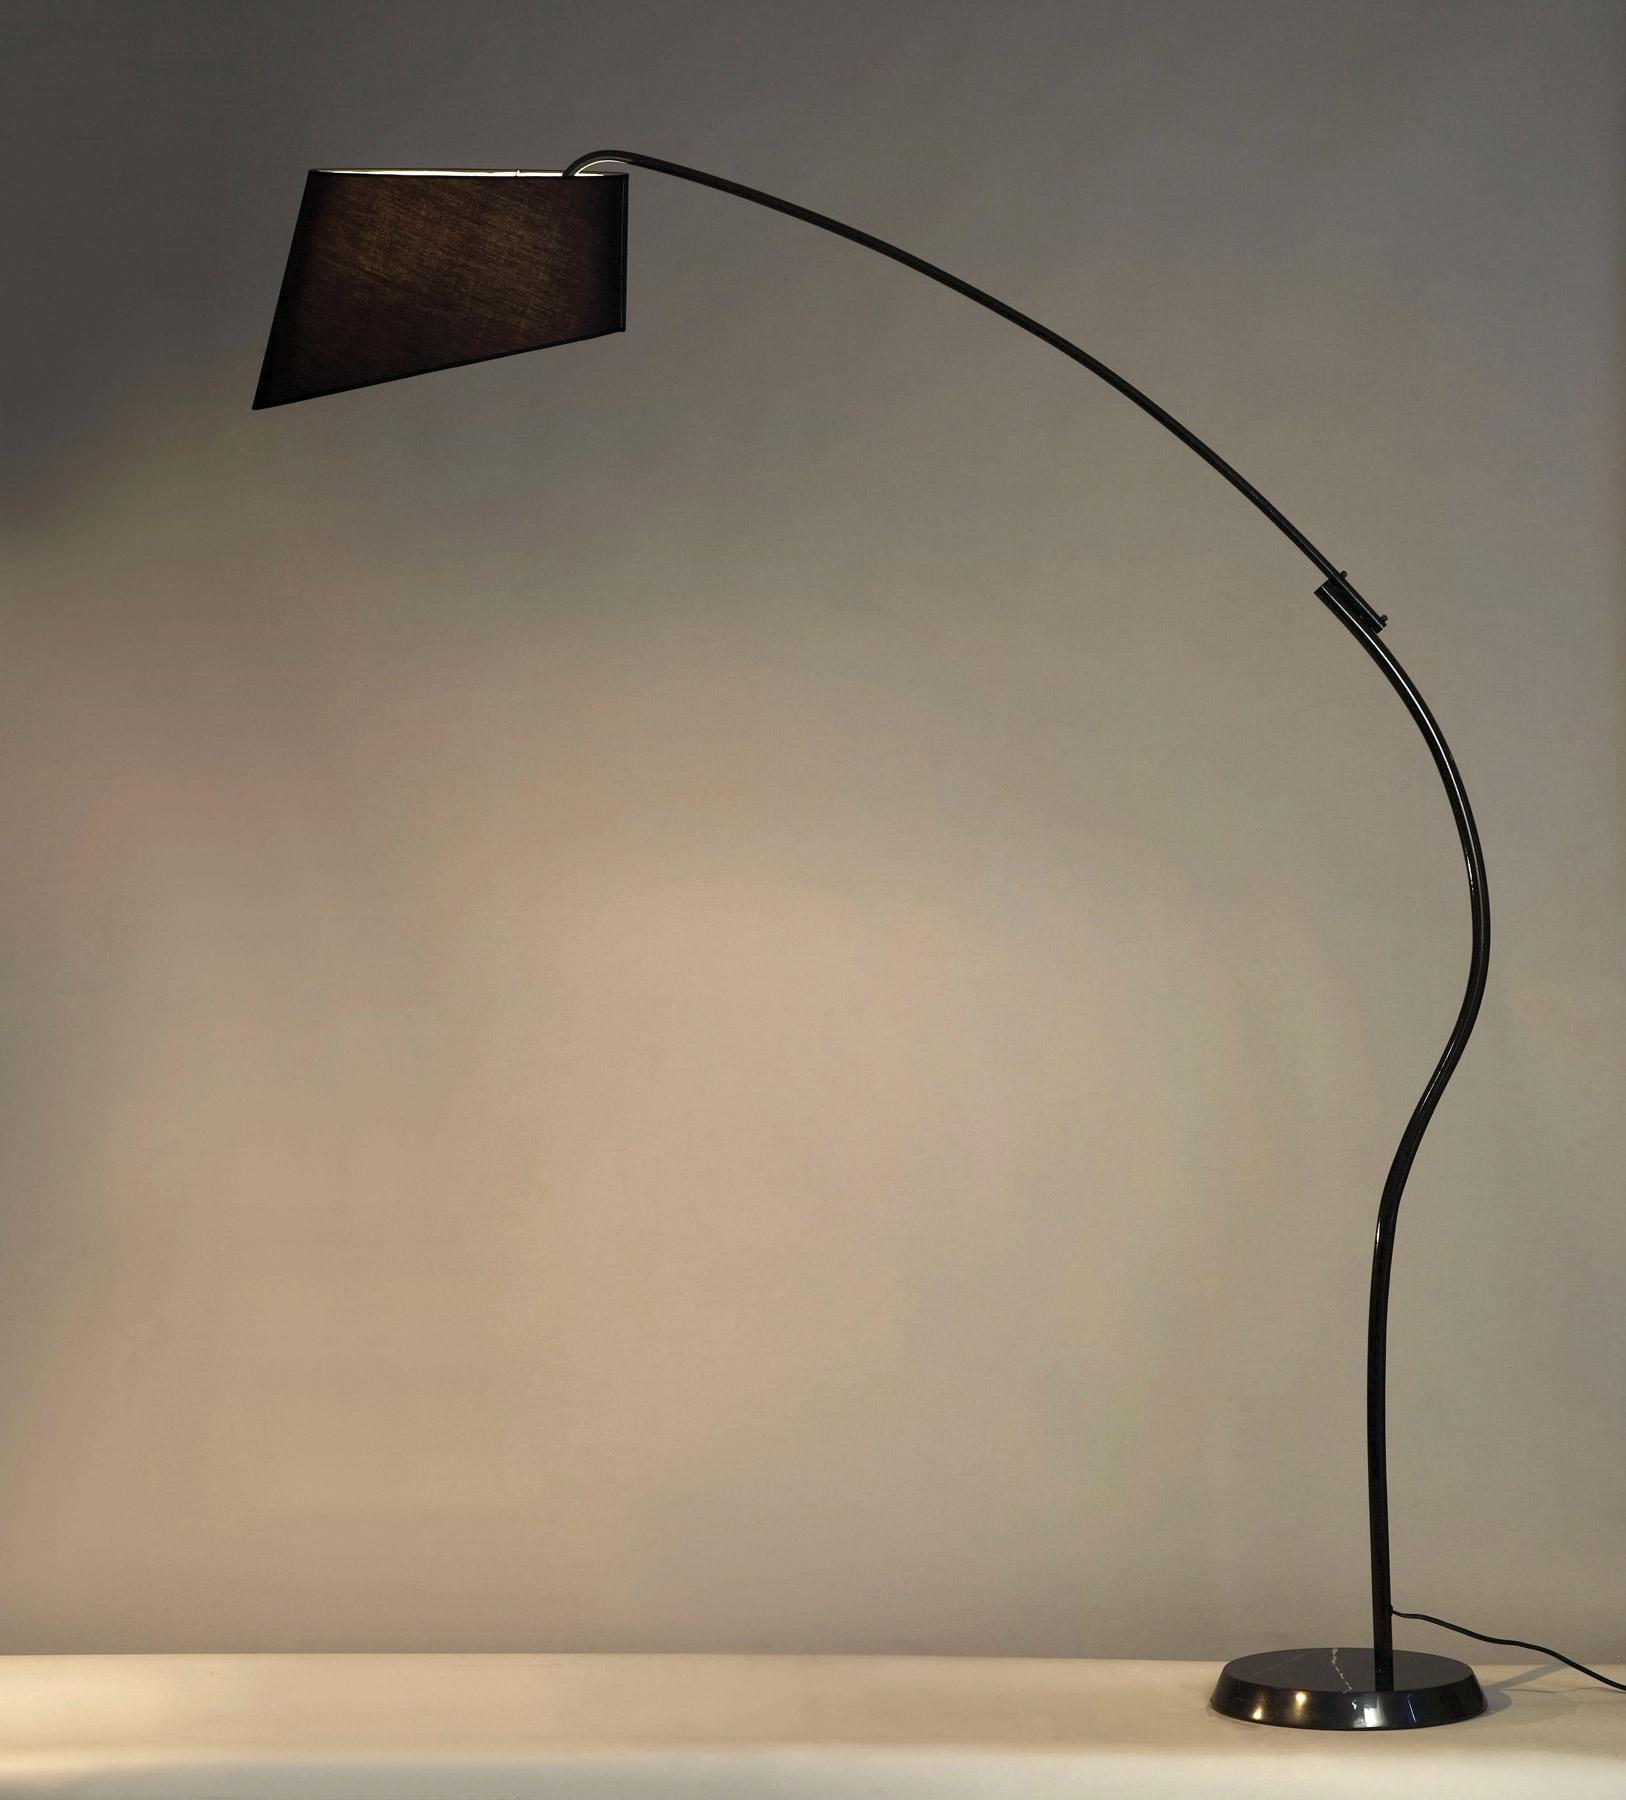 Lighting 11717 ibis black arc floor lamp nova lighting 11717 ibis black arc floor lamp mozeypictures Choice Image